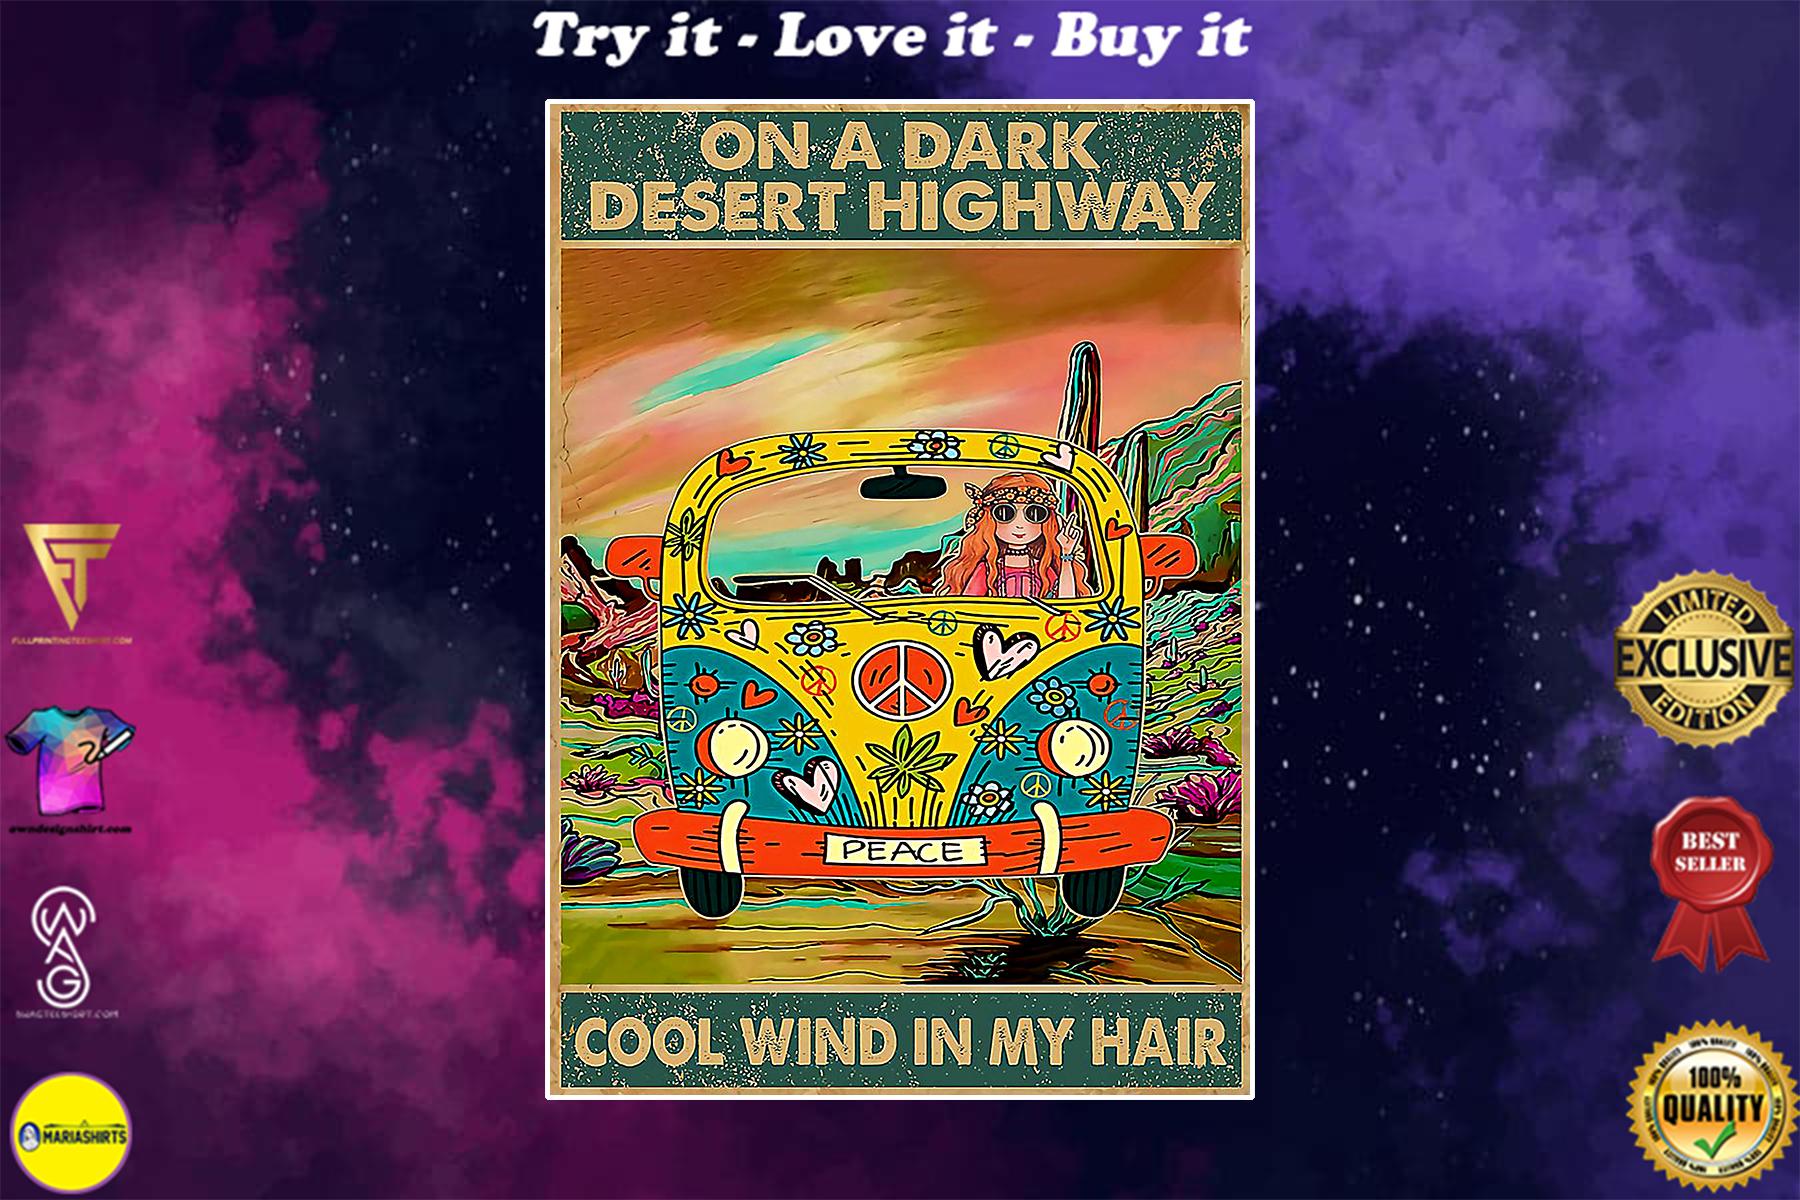 hippie girl on a dark desert highway cool wind in my hair vintage poster